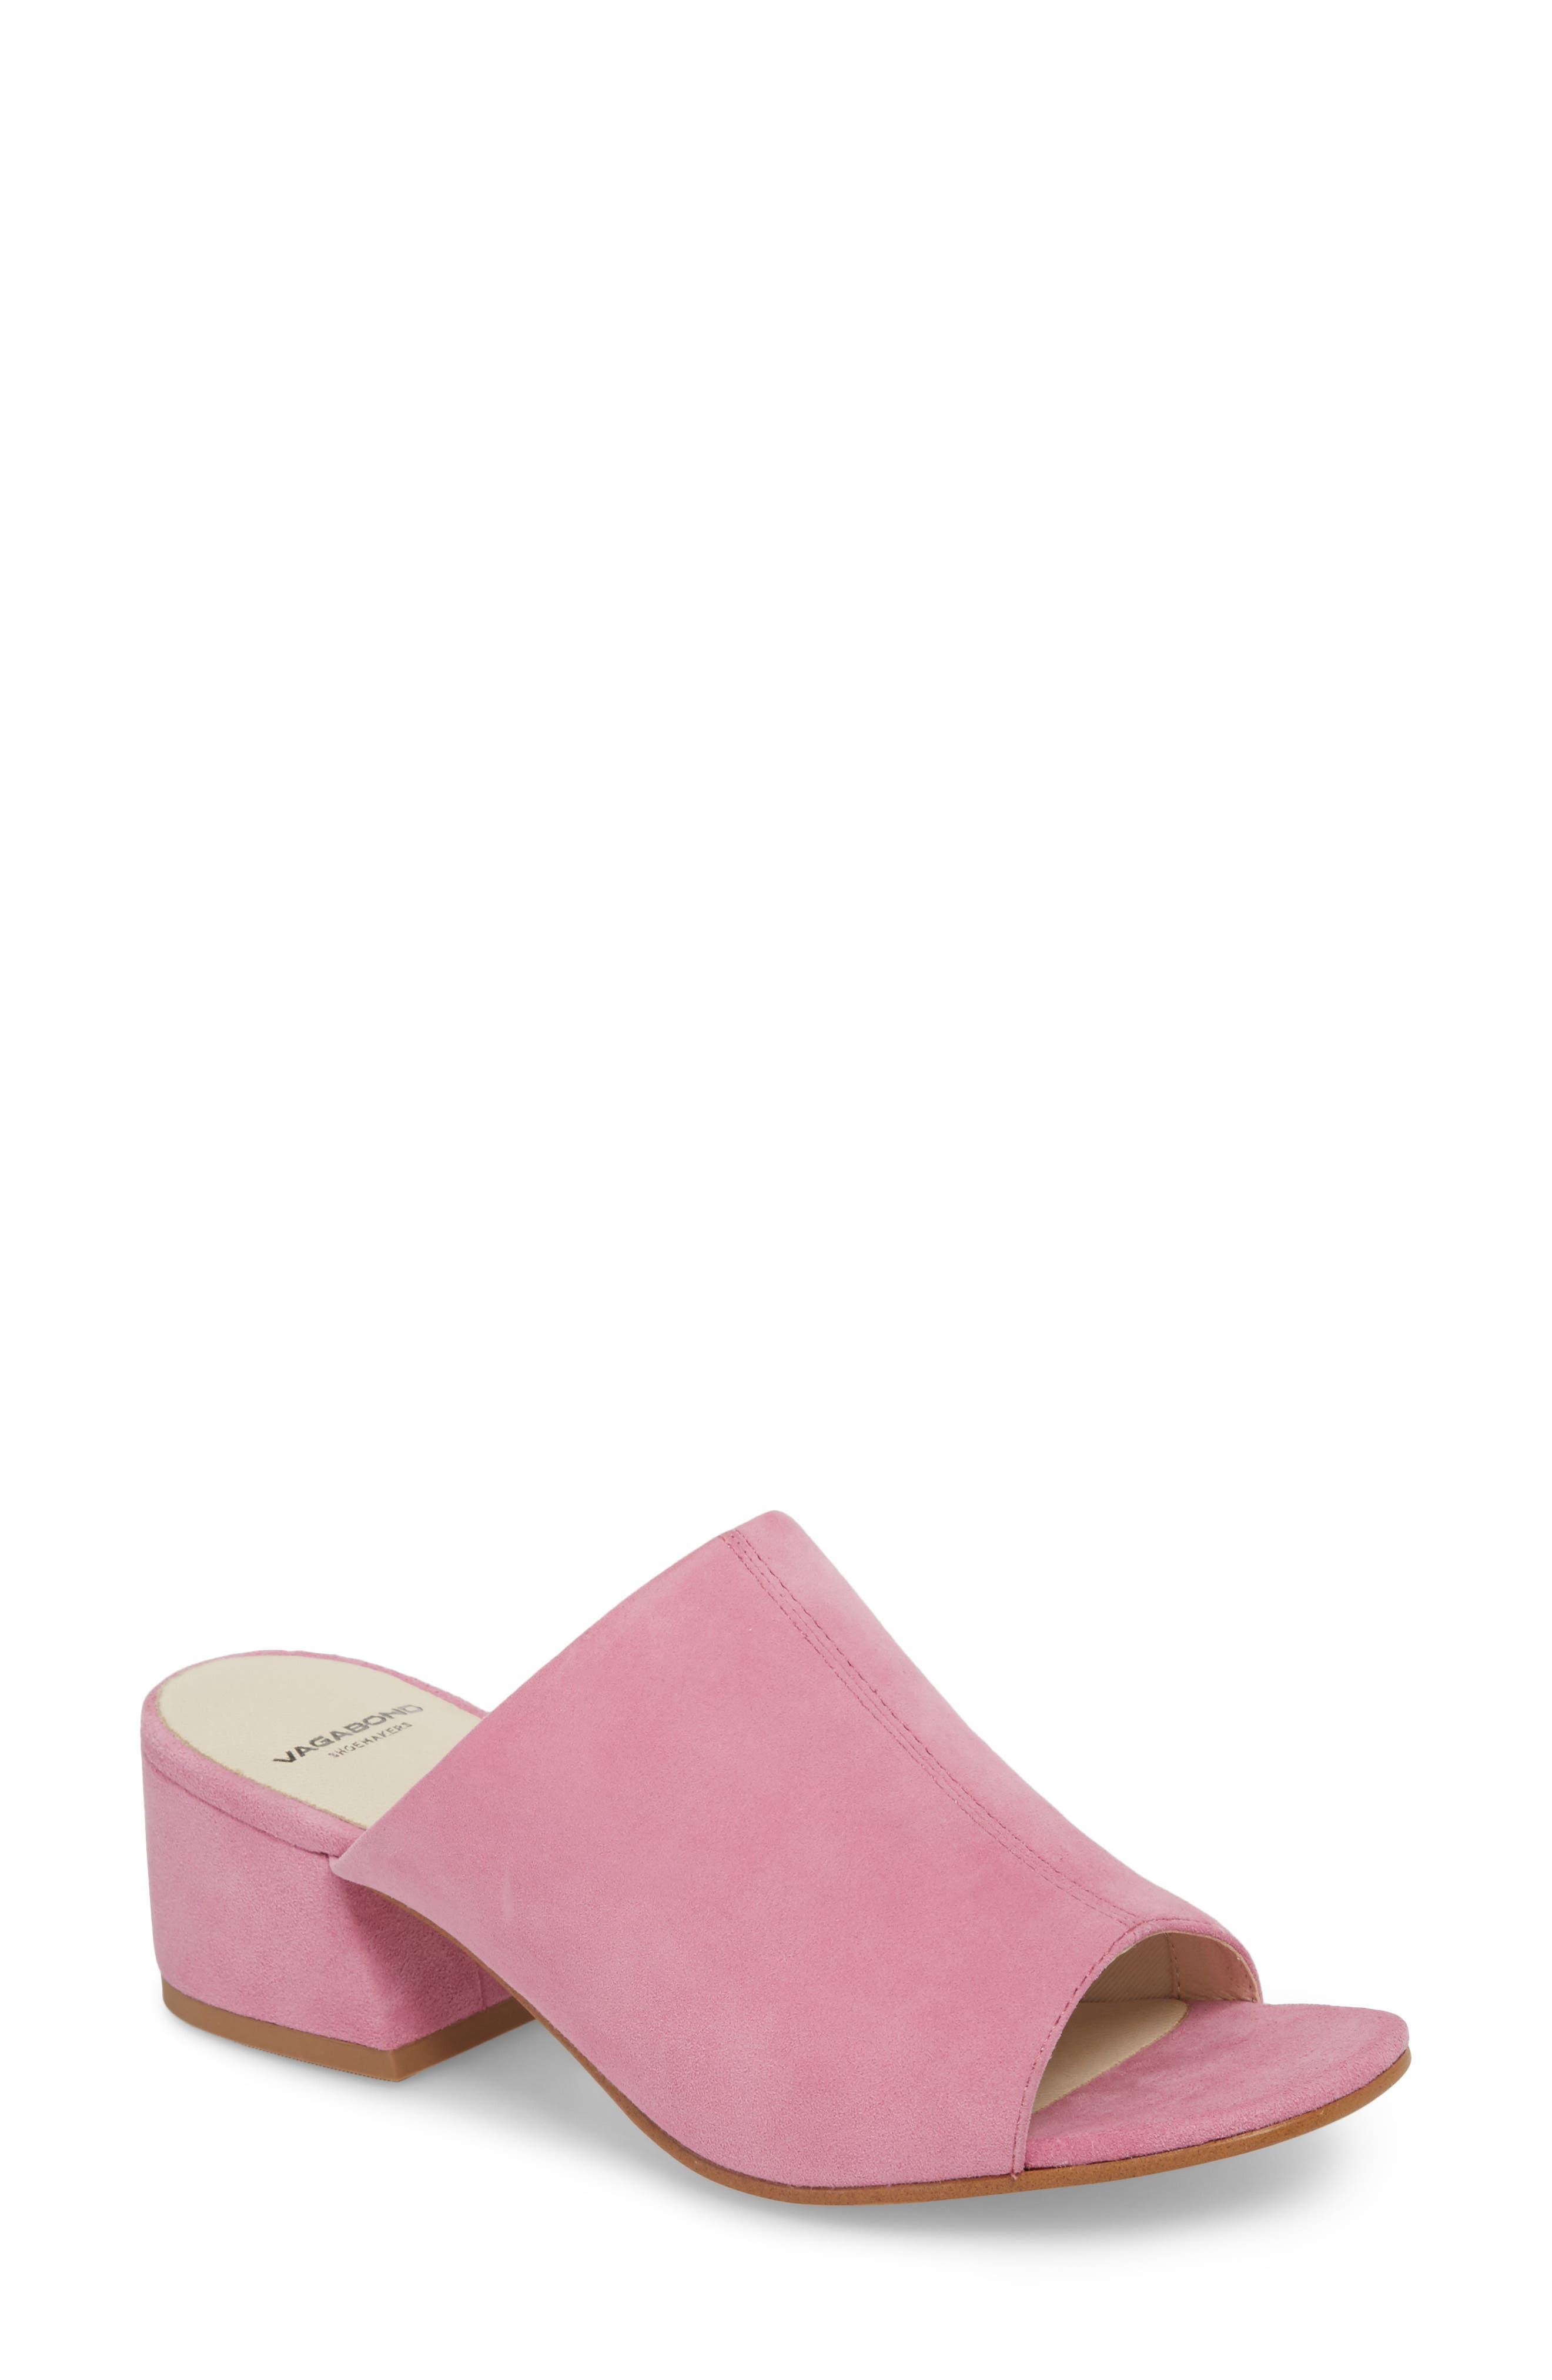 Vagabond Shoemakers Saide Slide Sandal, Pink